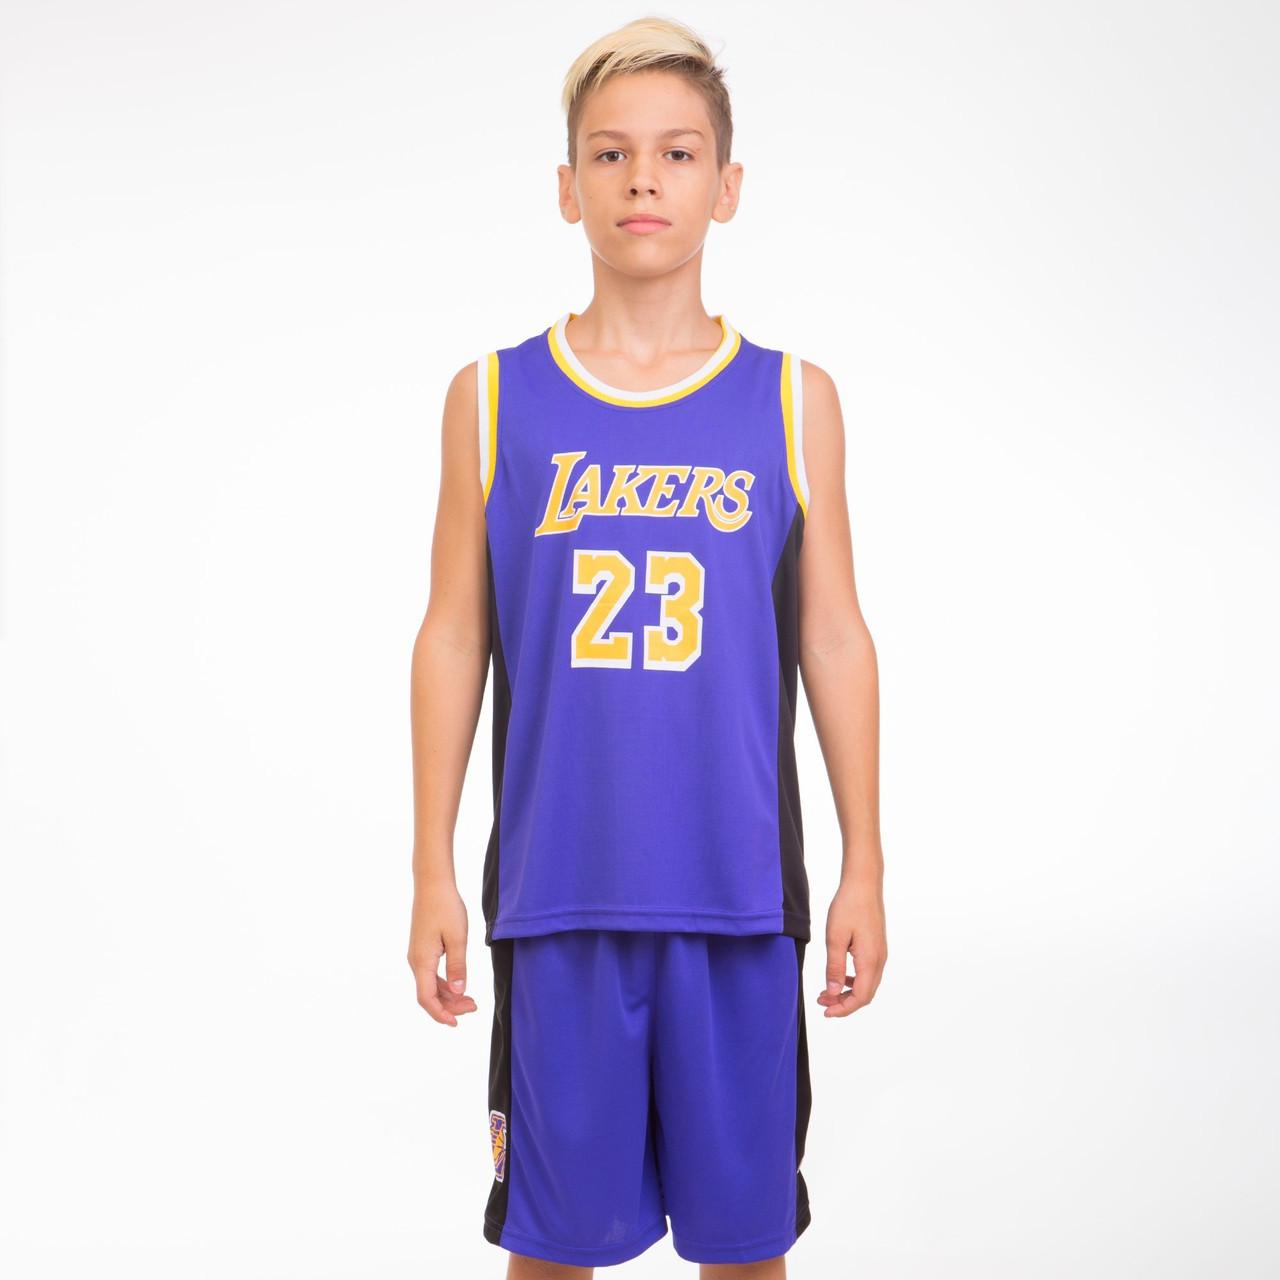 Форма баскетбольная подростковая NBA LAKERS 23 BA-0563-1